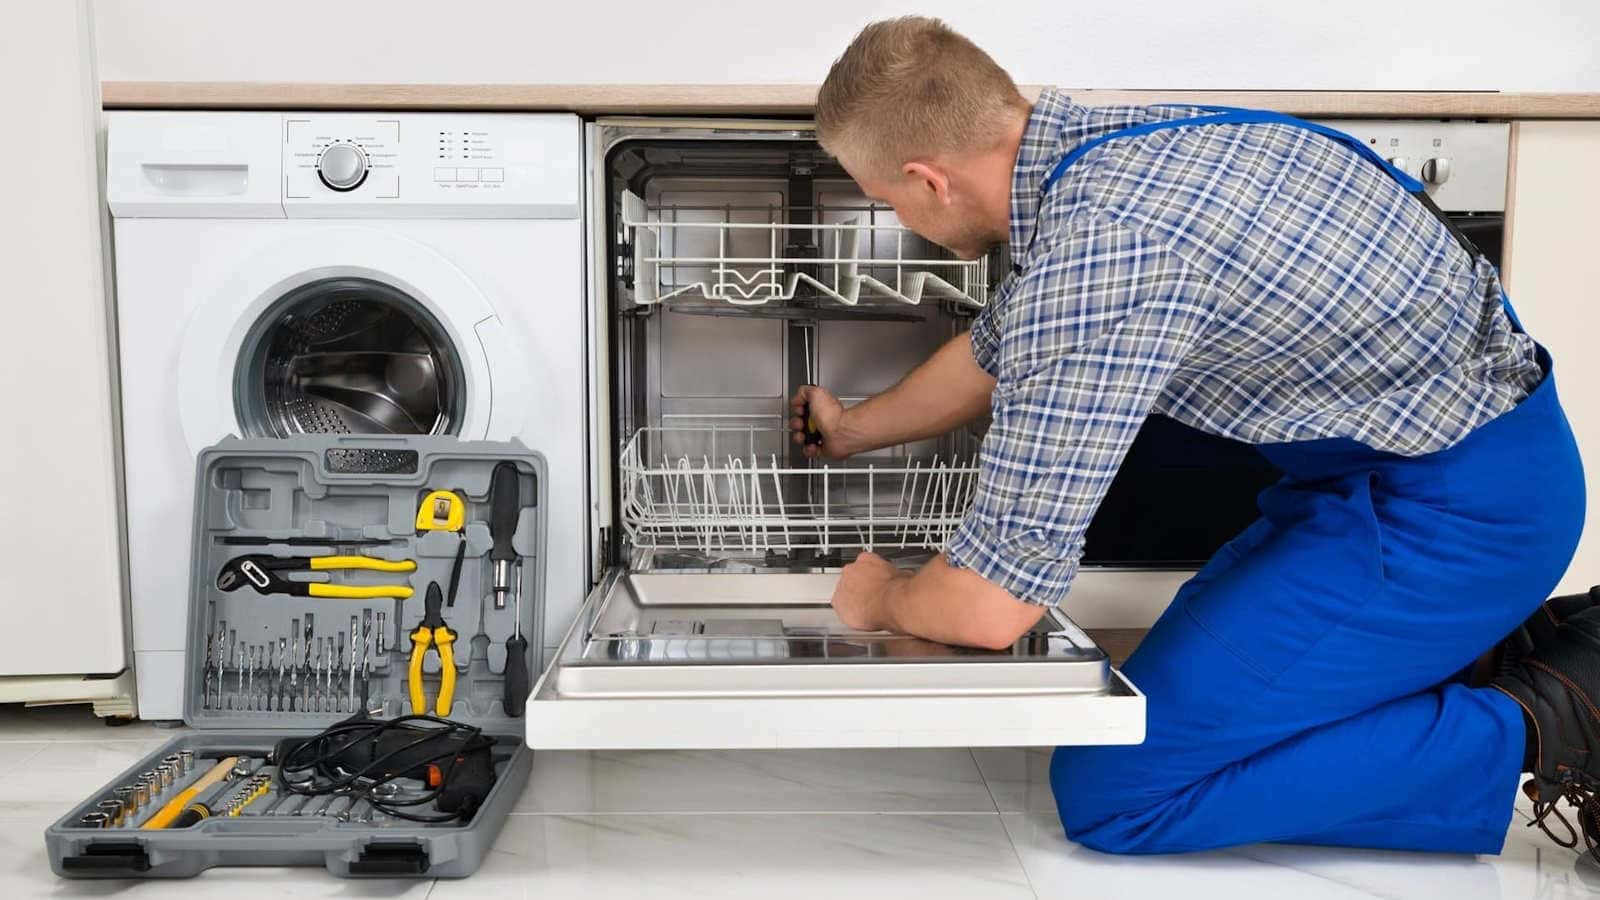 Able Appliance Repair in Lenexa